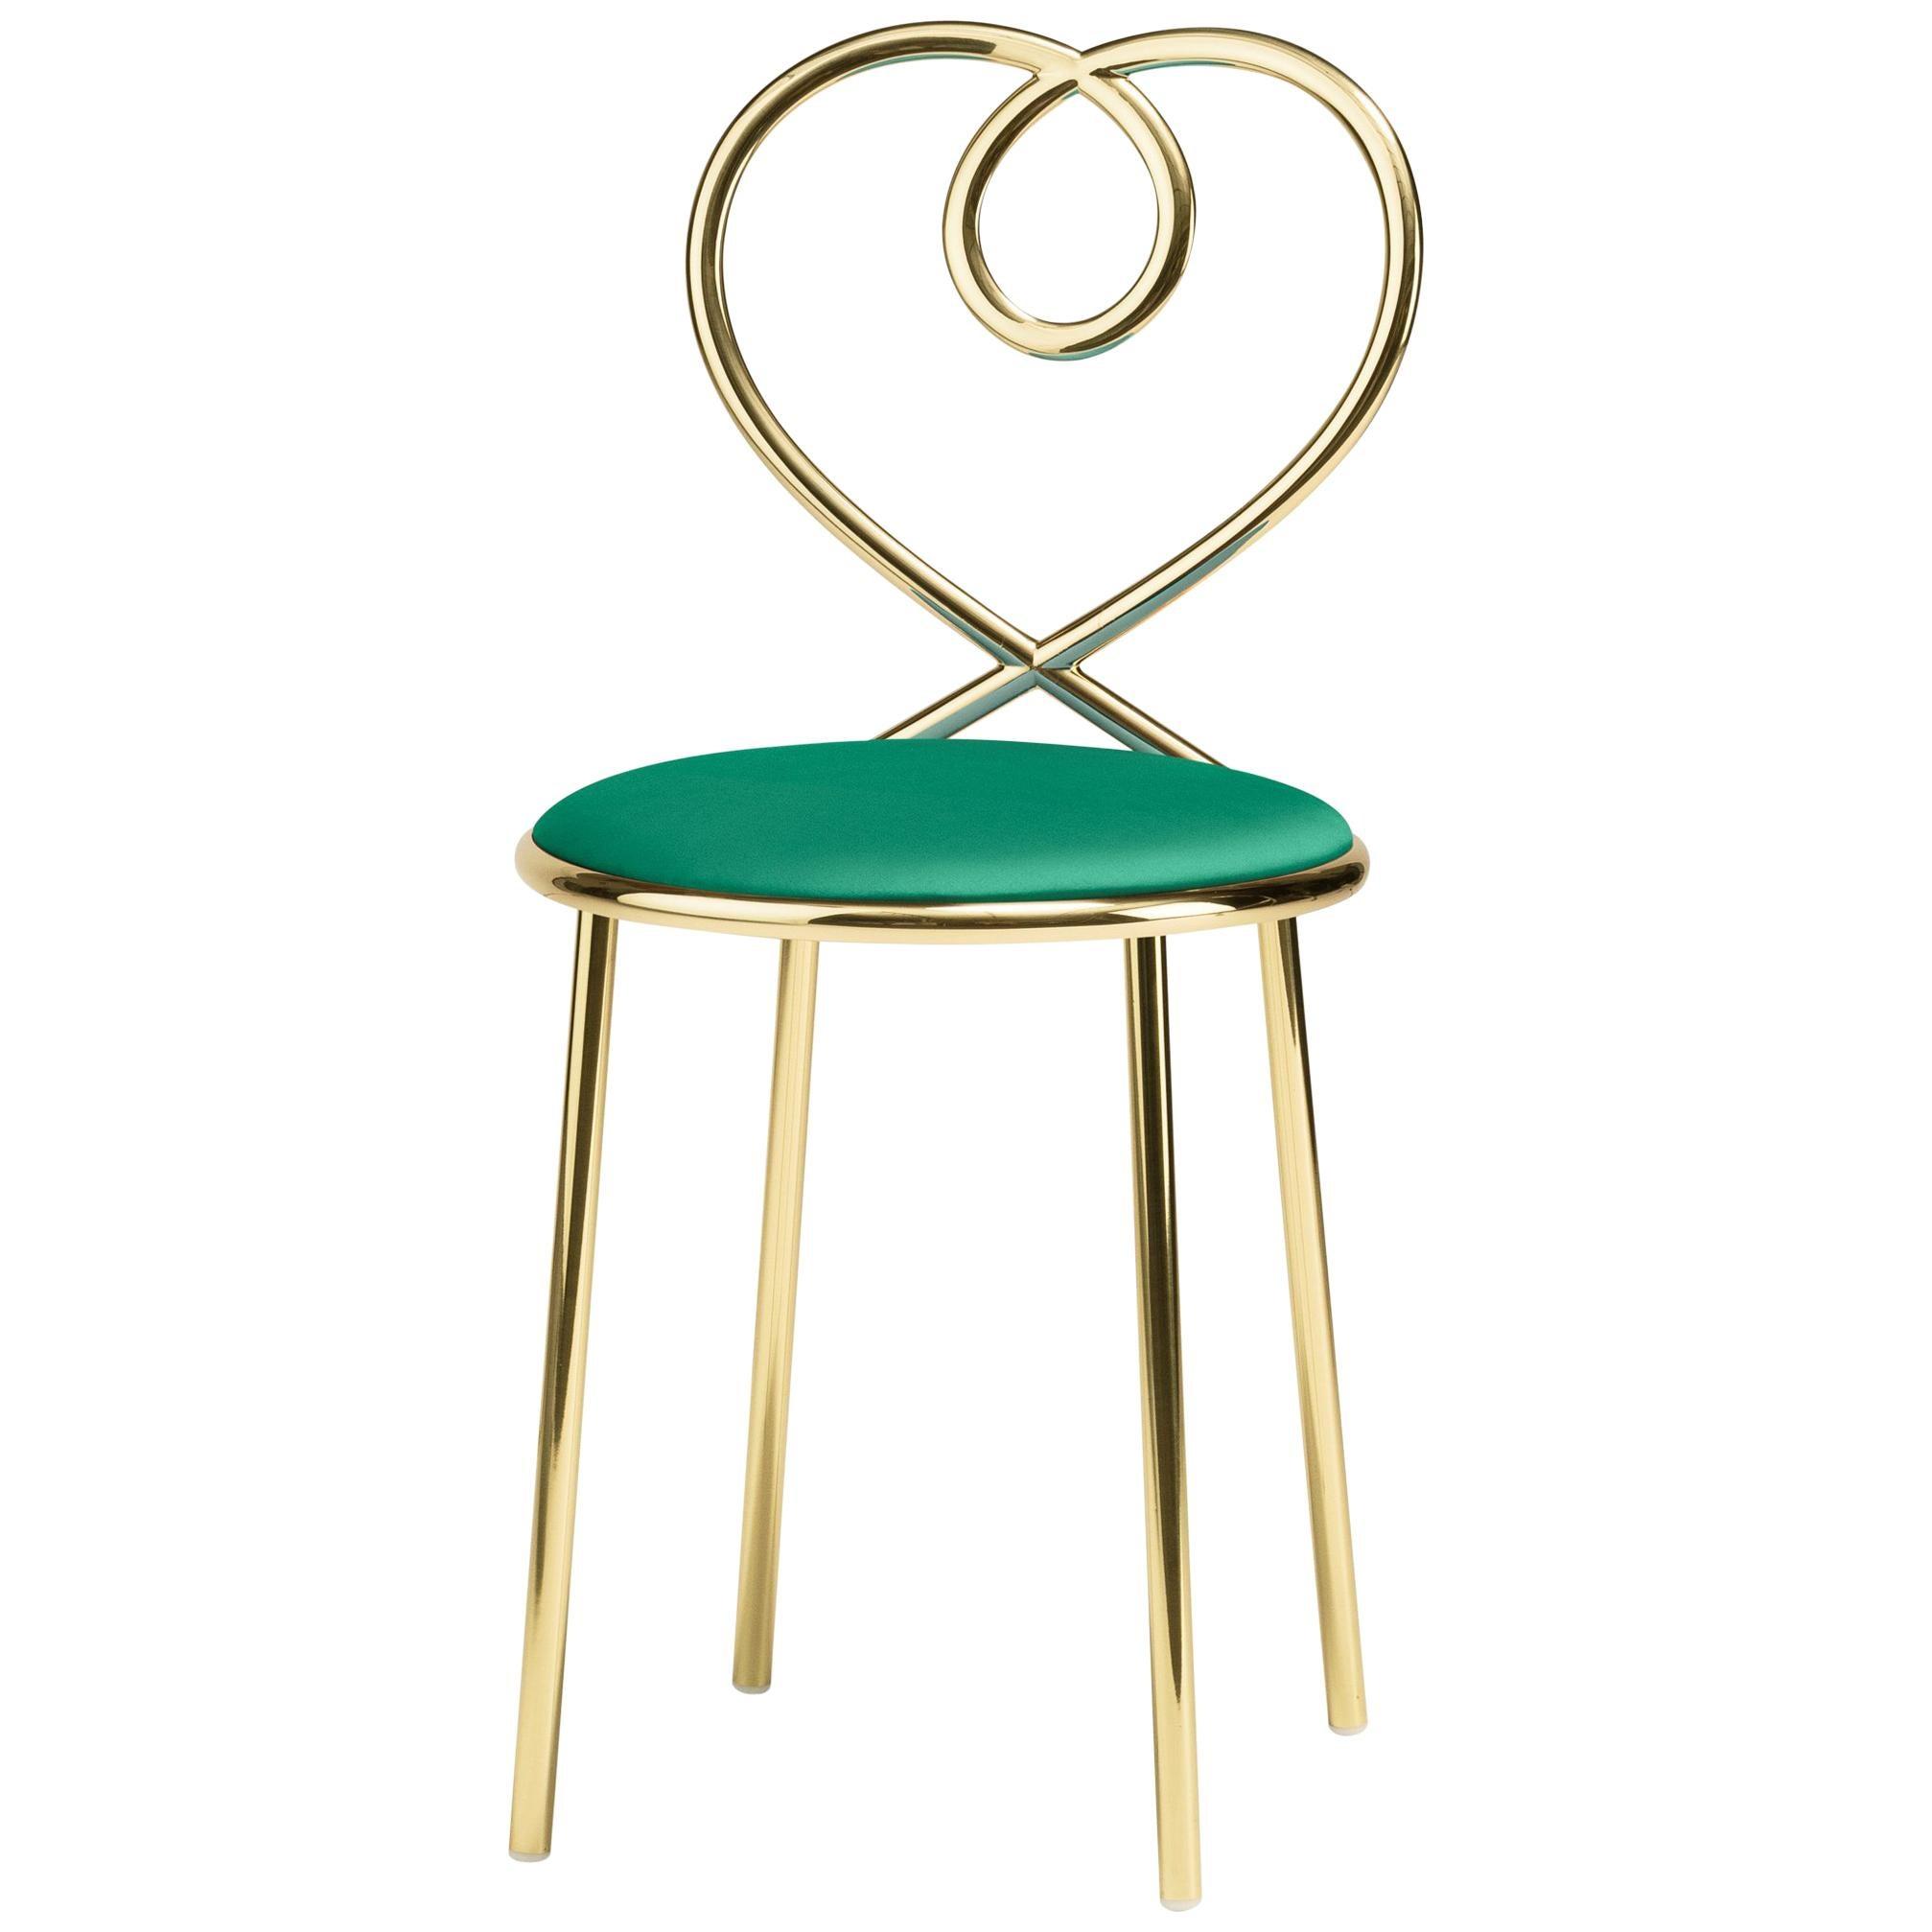 Ghidini 1961 Love Chair Malachite in Polished Brass by Nika Zupanc